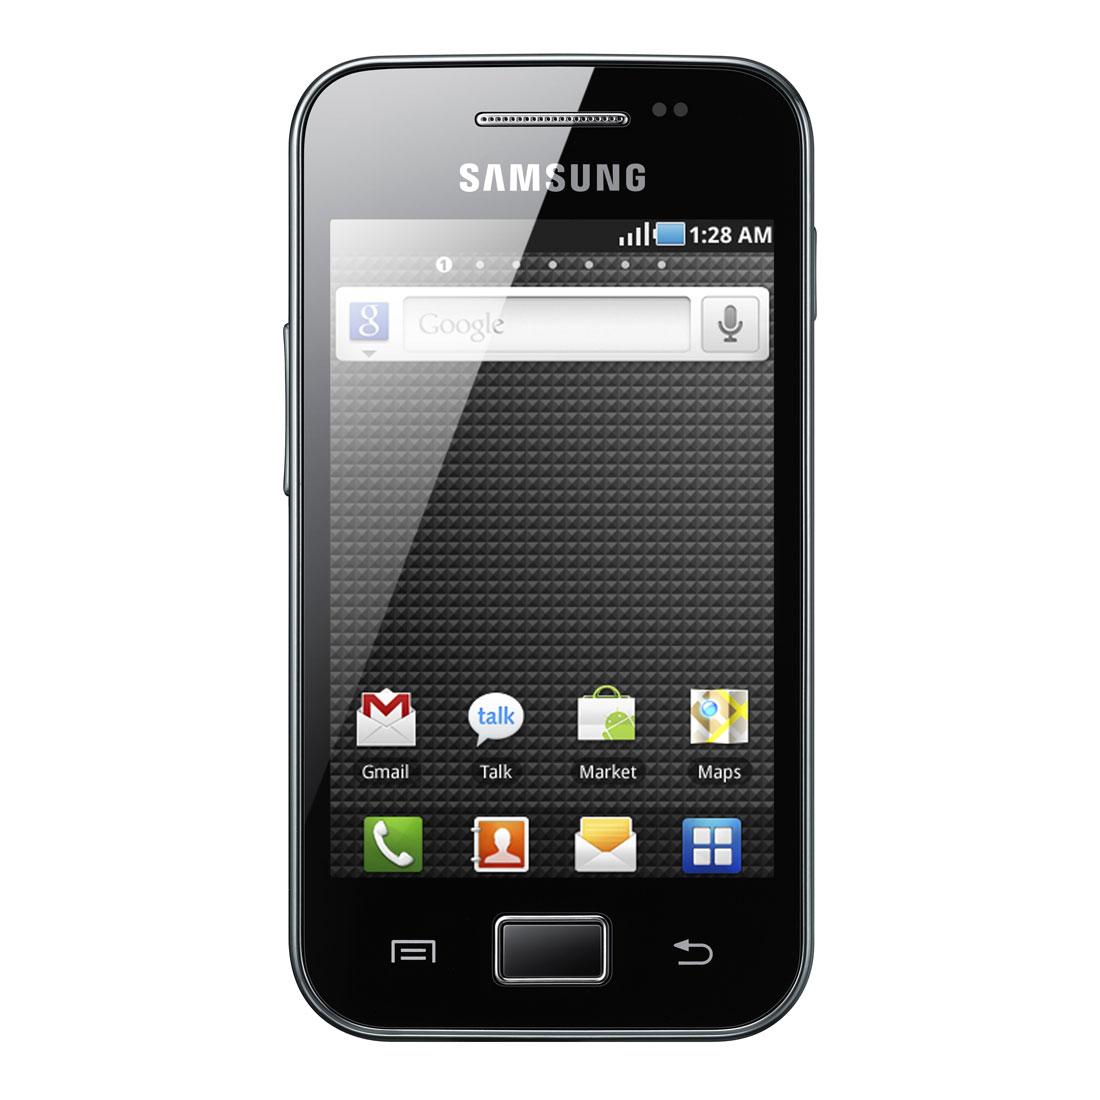 ROM Stock para Samsung Galaxy Ace 236 KPL vercin de Latinoamerica  UniversoTecno